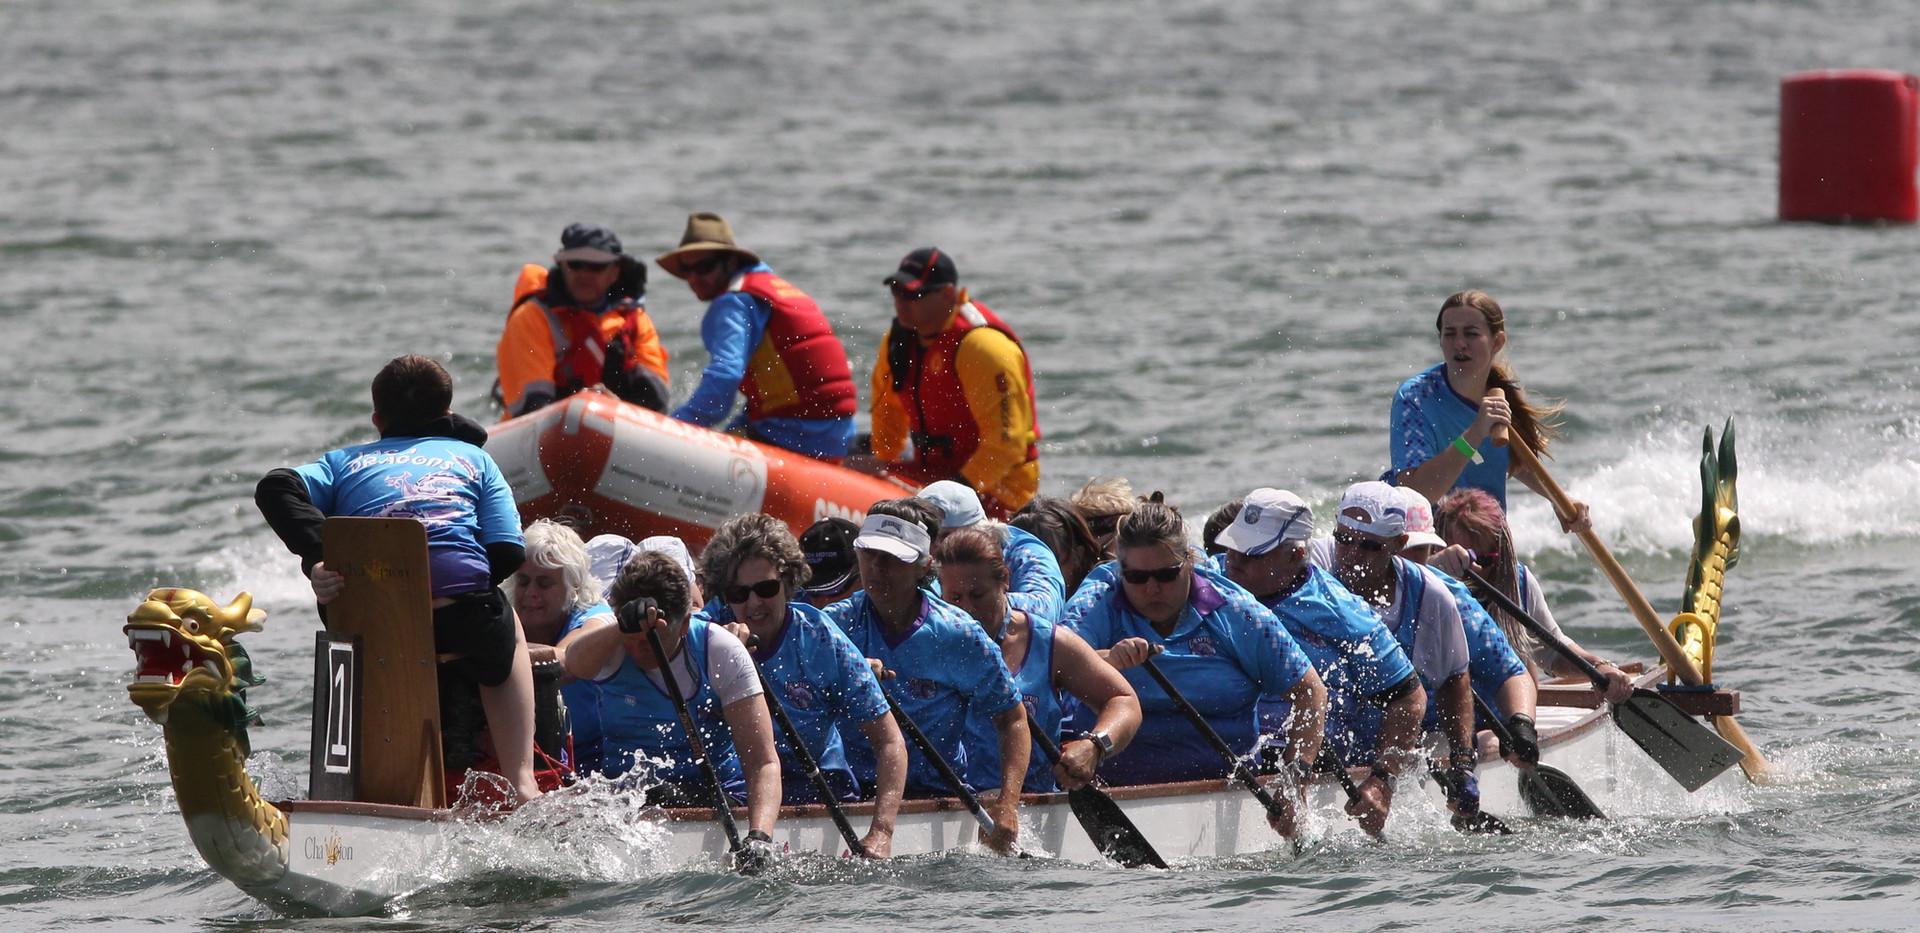 Grafton Dragon Boat Club, Grafton, Dragon Boat Club, Dragon Boat, Dragon Boating, Boating, Rowing, Row, Club, Clarence Valley, NSW, Jacaranda, Clarence River, River, Water Sport, Water Sports, Sport, Sporting, Sports, Team, Festival, Event, Events